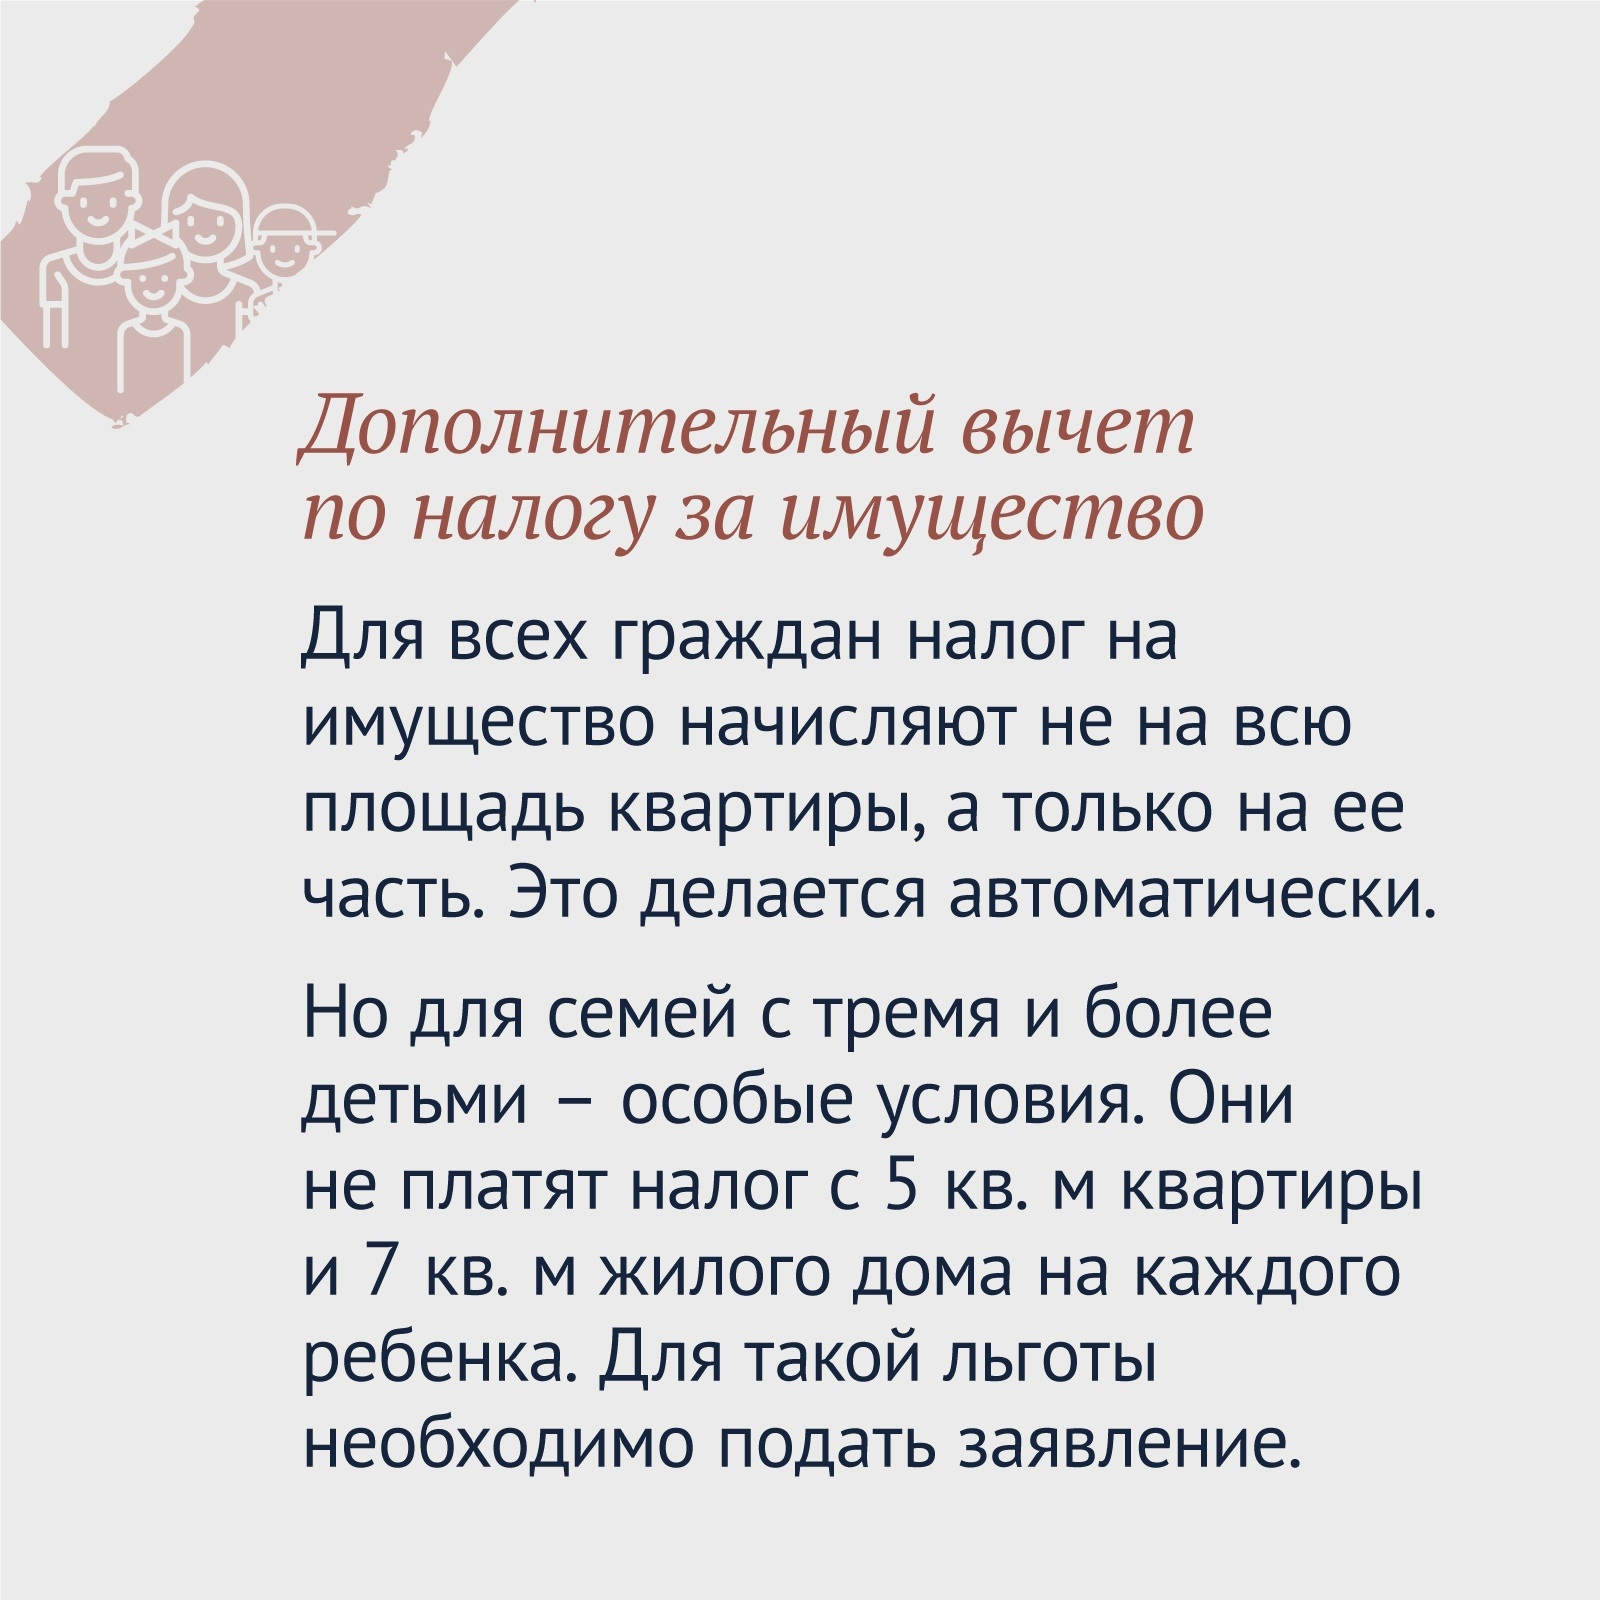 https://sun7-9.userapi.com/c858032/v858032646/16a51e/C0GOOqzguj0.jpg